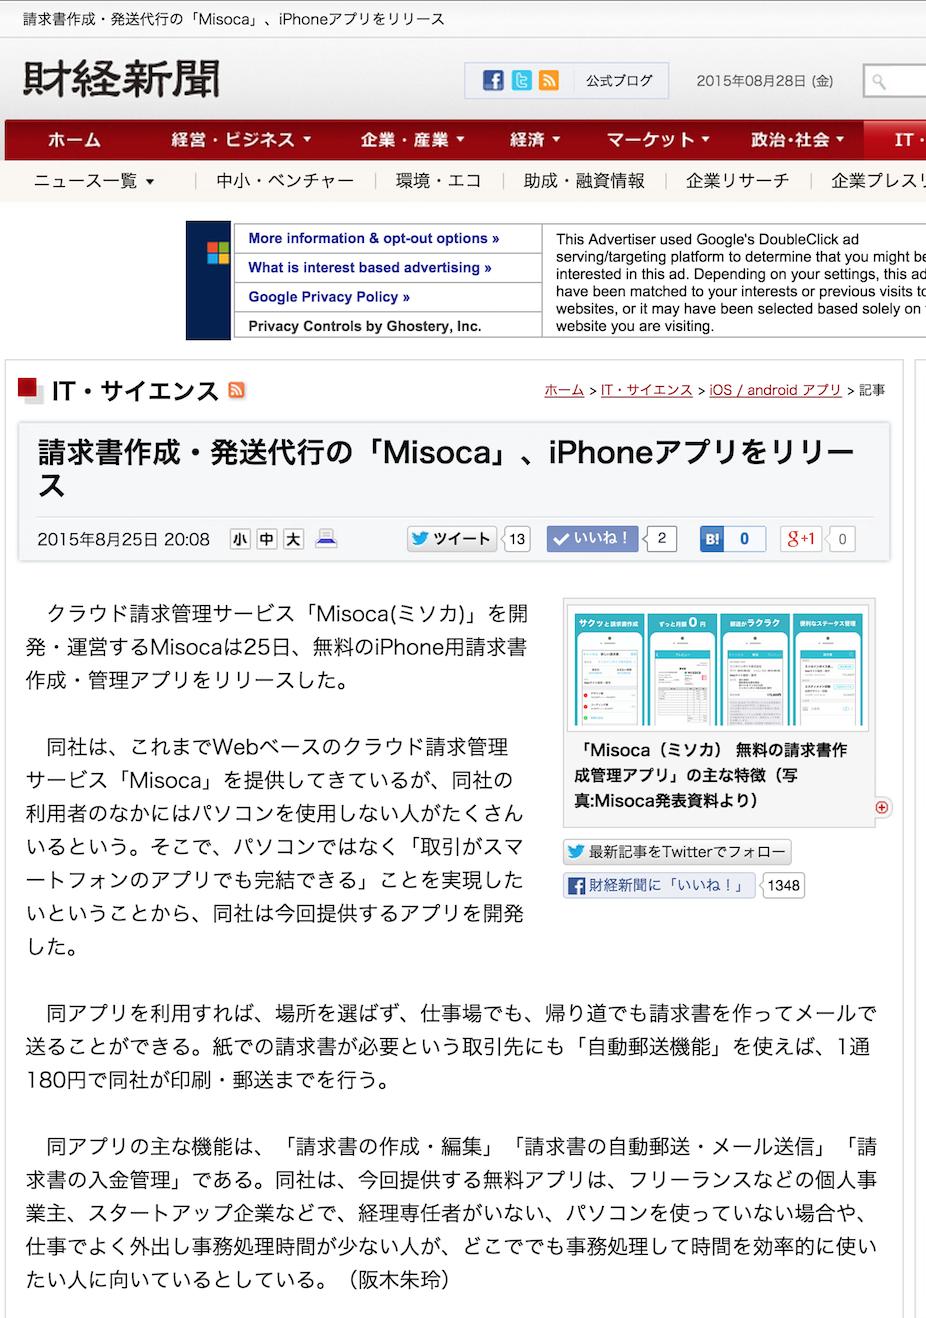 「財経新聞」に掲載 〜 請求書作成・発送代行の「Misoca」、iPhone ...